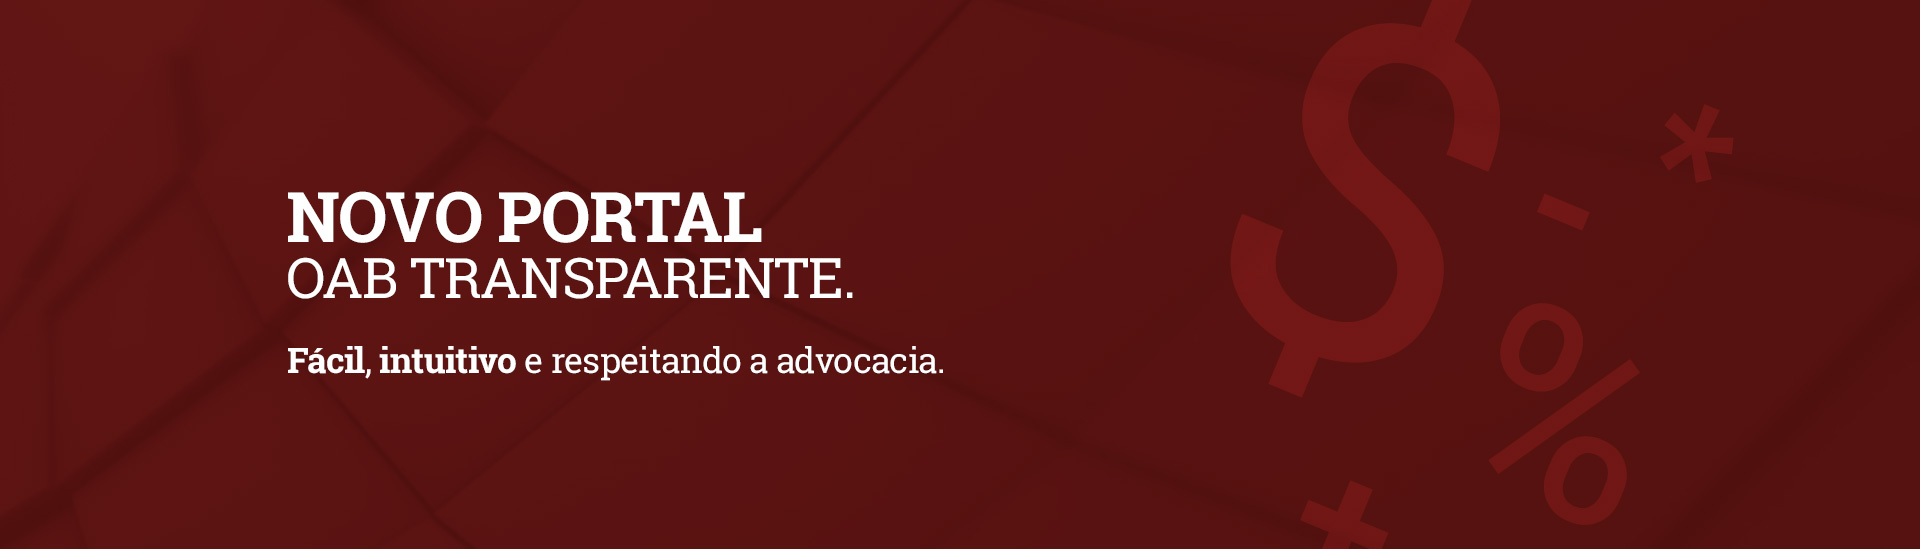 Portal da Transparência - OAB Goiás